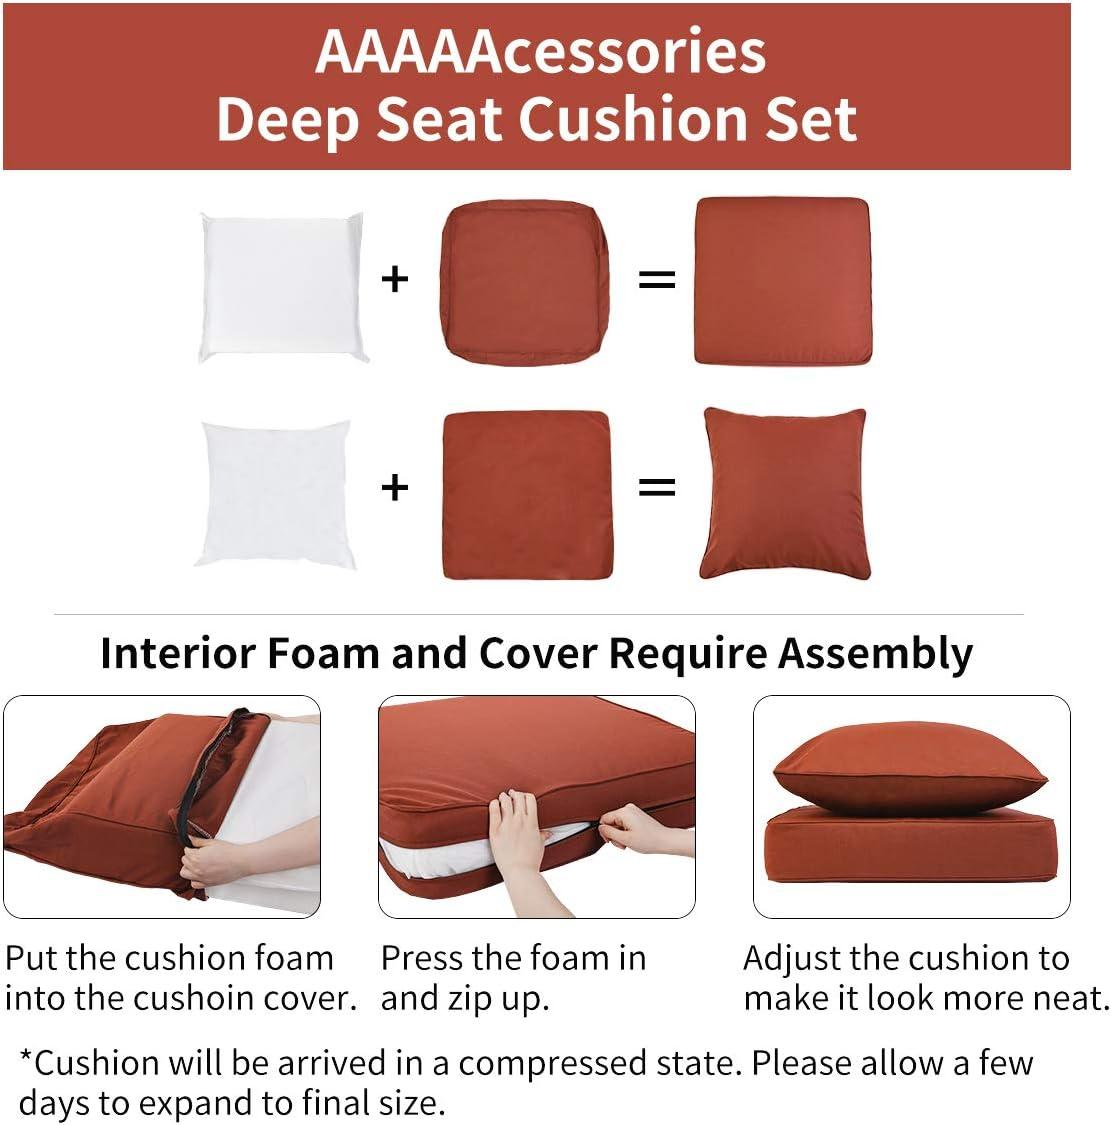 Replacement Patio Furniture Cushions Beige 24 x 24 x 5 Inch AAAAAcessories Outdoor//Indoor Water-Resistant Deep Seat Chair Cushion Set